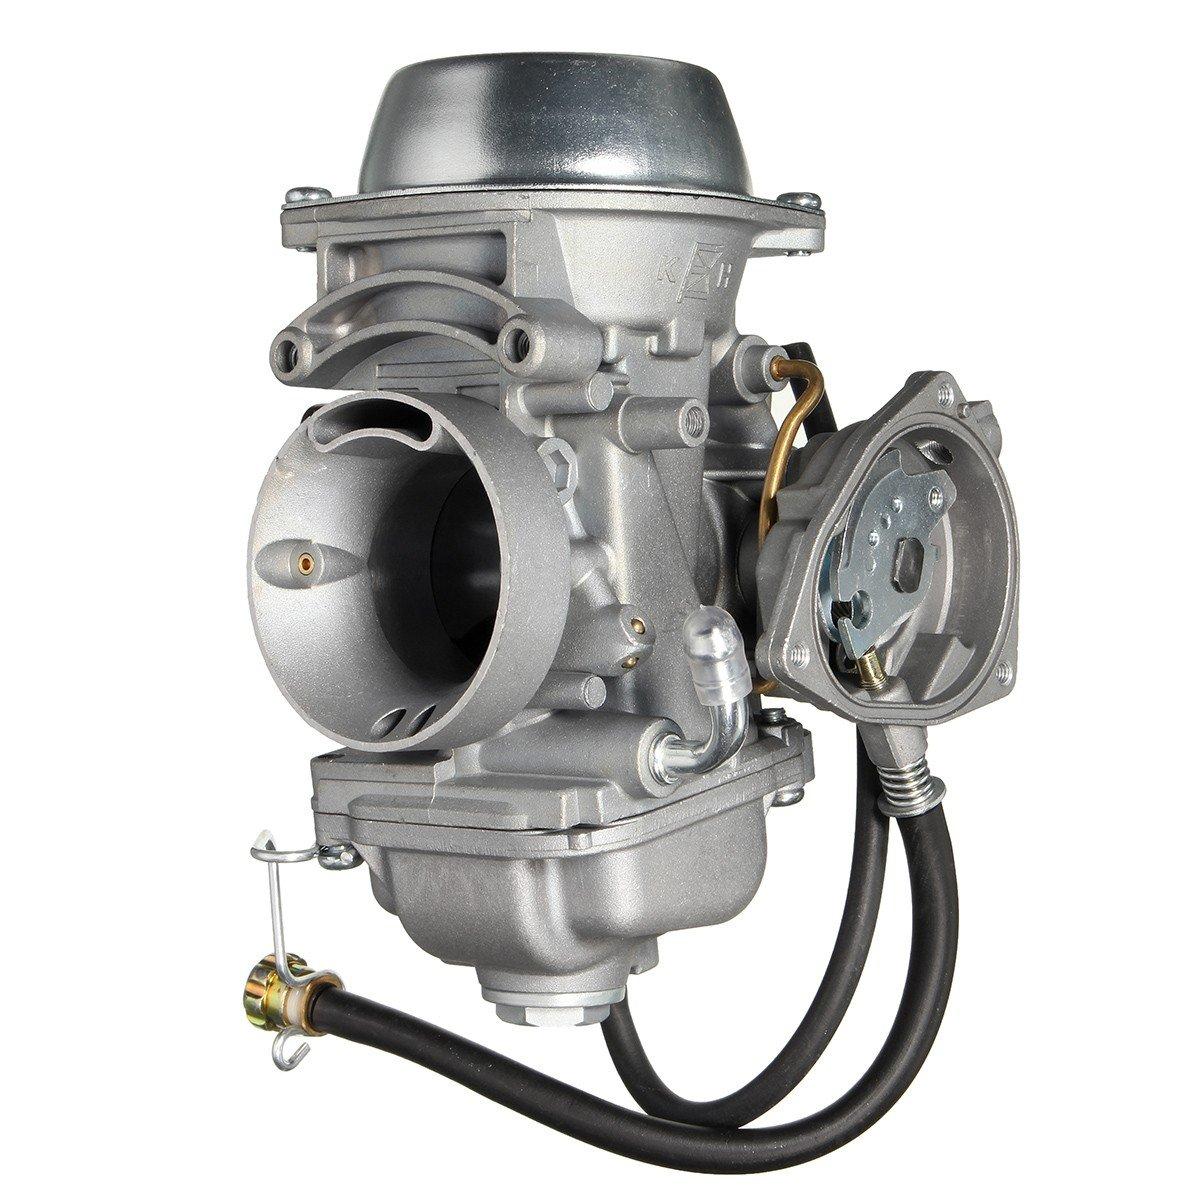 Forspero Carburetor Carb Kit For Polaris Sportsman ATV 500 4X4HO 2001-2005 2010-2012